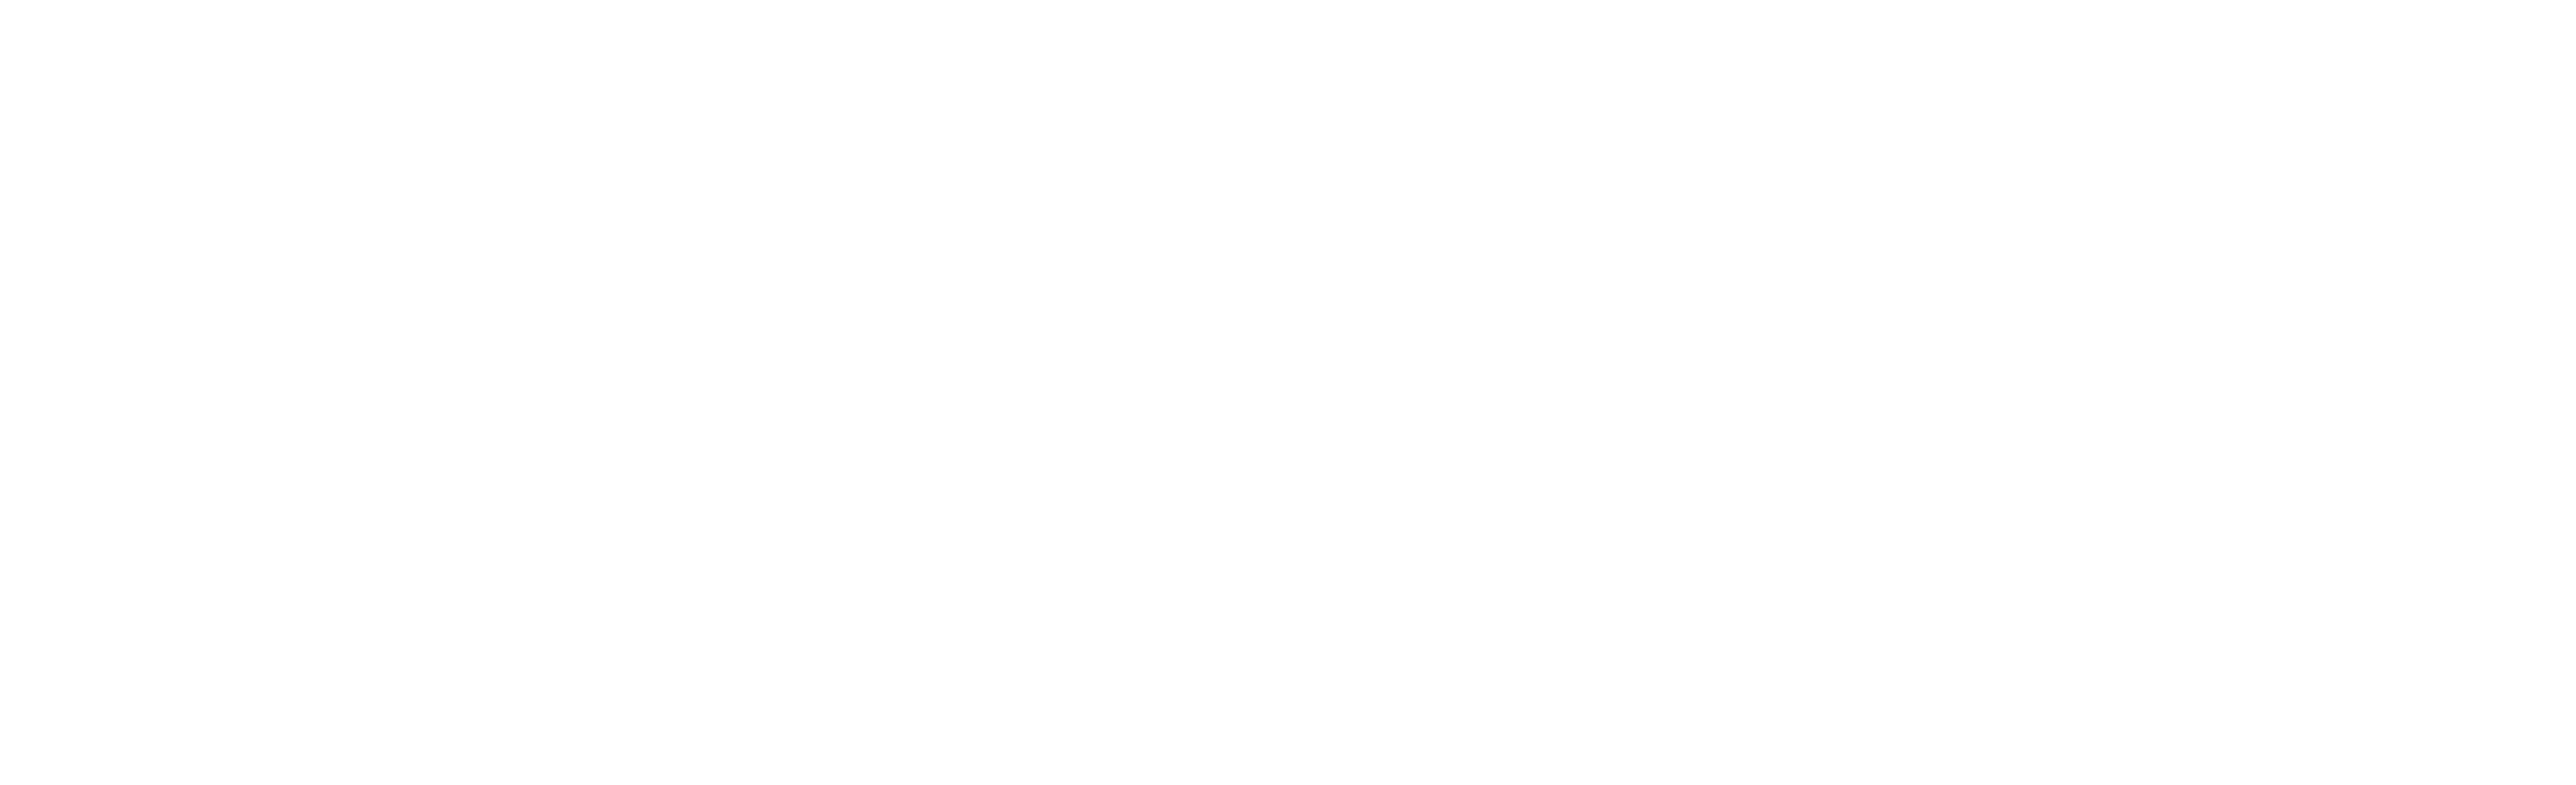 Meadowland Charter School